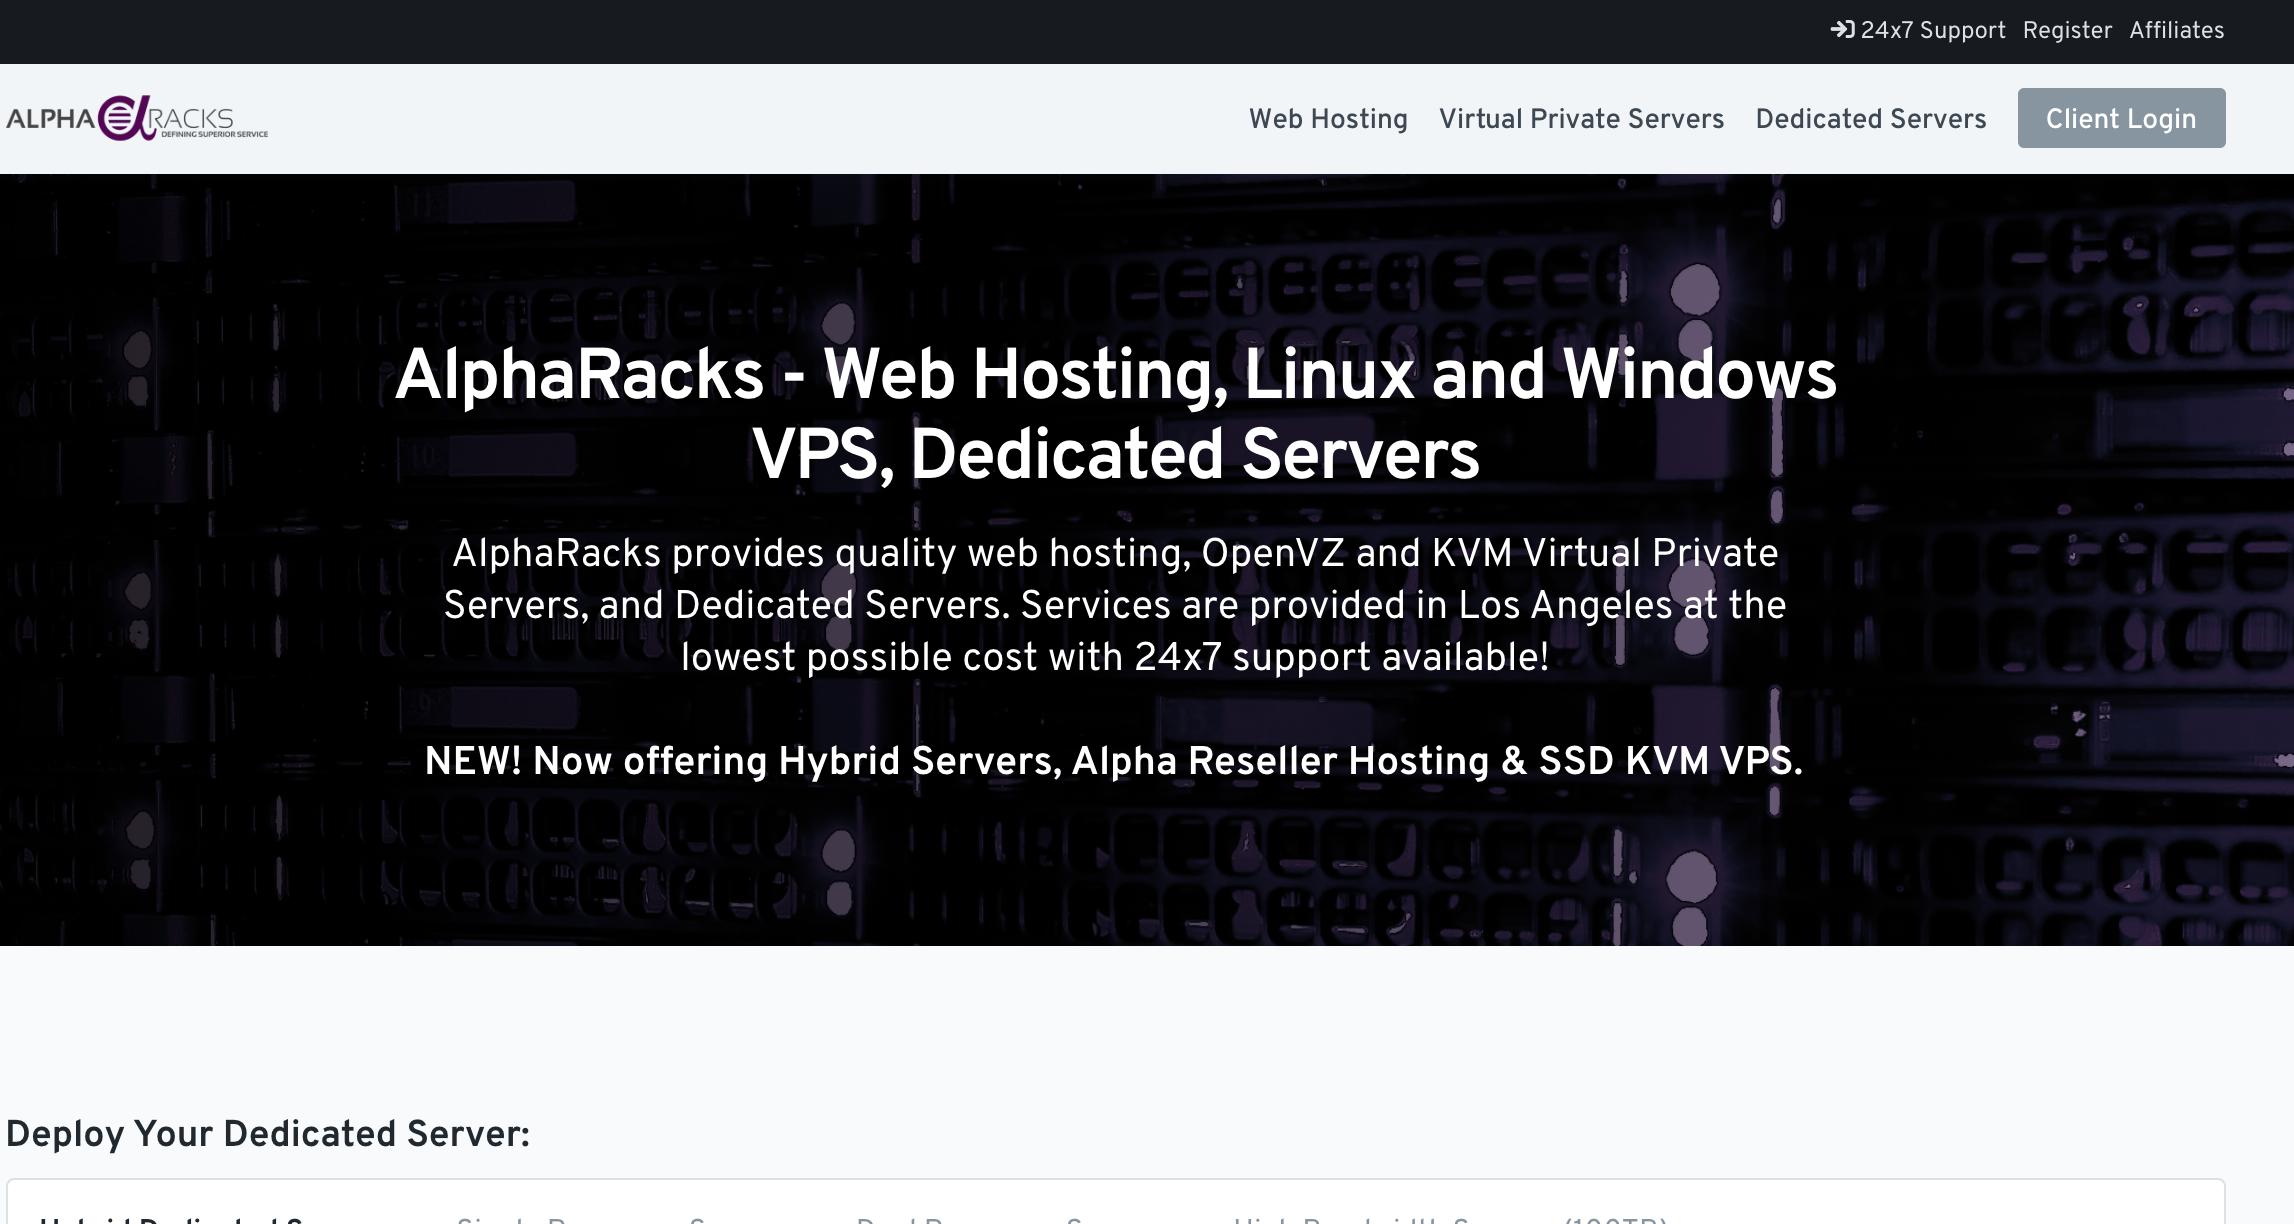 AlphaRacks月付19美元混合专用服务器,双Intel Xeon E5-2650 4x 2.00GHz,8GB内存,500GB存储,5个IPv4,免费IPv6,洛杉矶数据中心,AlphaRacks服务器优惠码